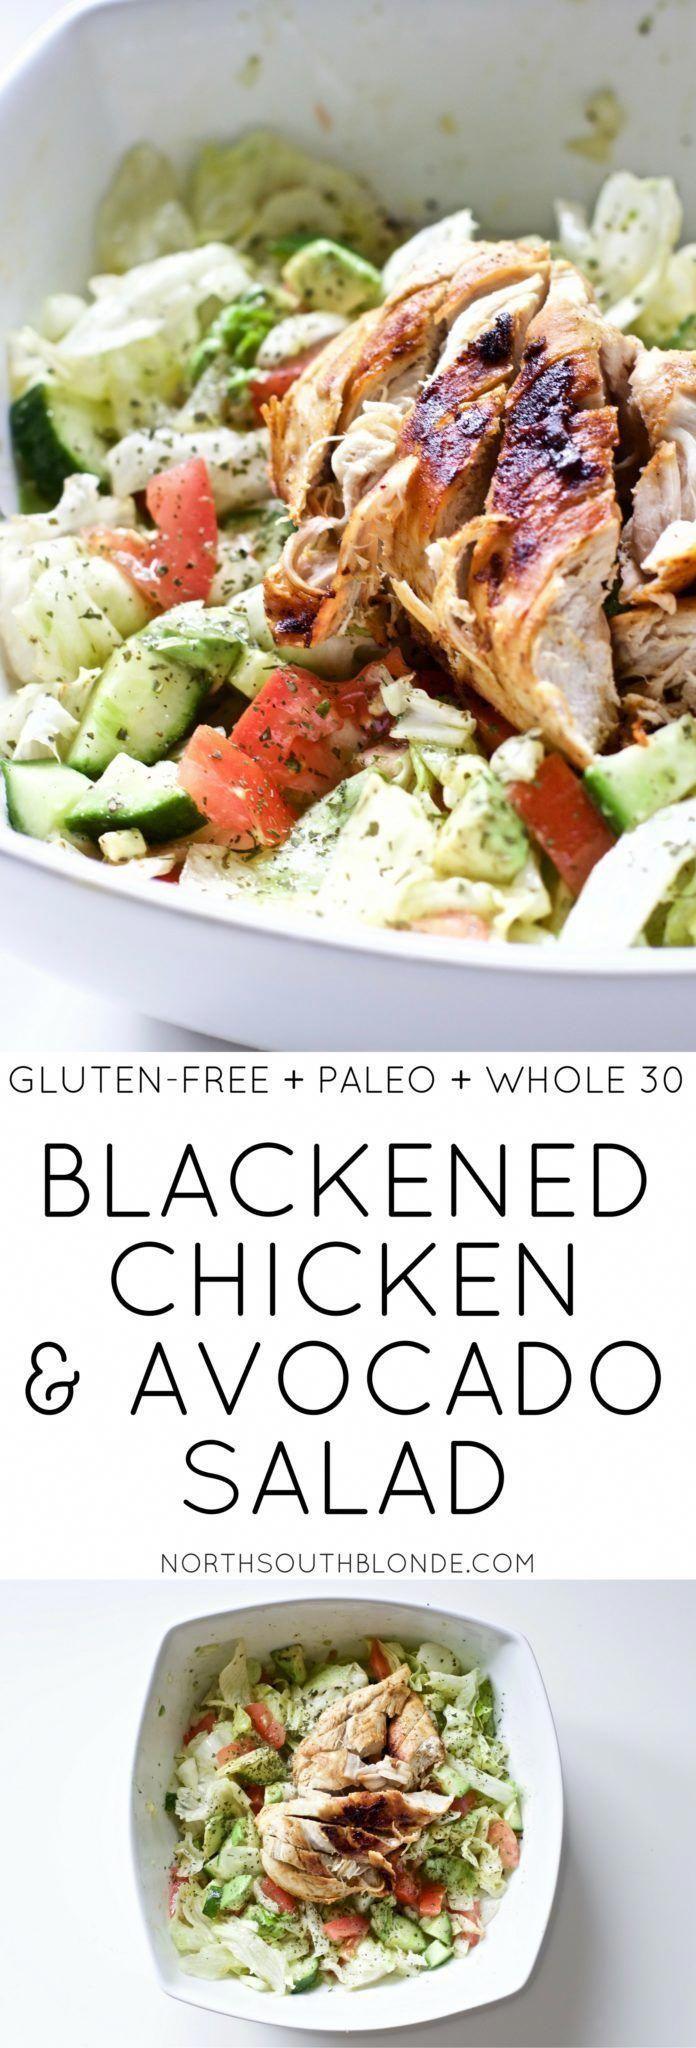 Blackened Chicken and Avocado Salad (Gluten-Free, Paleo, Whole 30) #BestFoodForGoodHealth #blackenedchicken Blackened Chicken and Avocado Salad (Gluten-Free, Paleo, Whole 30) #BestFoodForGoodHealth #blackenedchicken Blackened Chicken and Avocado Salad (Gluten-Free, Paleo, Whole 30) #BestFoodForGoodHealth #blackenedchicken Blackened Chicken and Avocado Salad (Gluten-Free, Paleo, Whole 30) #BestFoodForGoodHealth #blackenedchicken